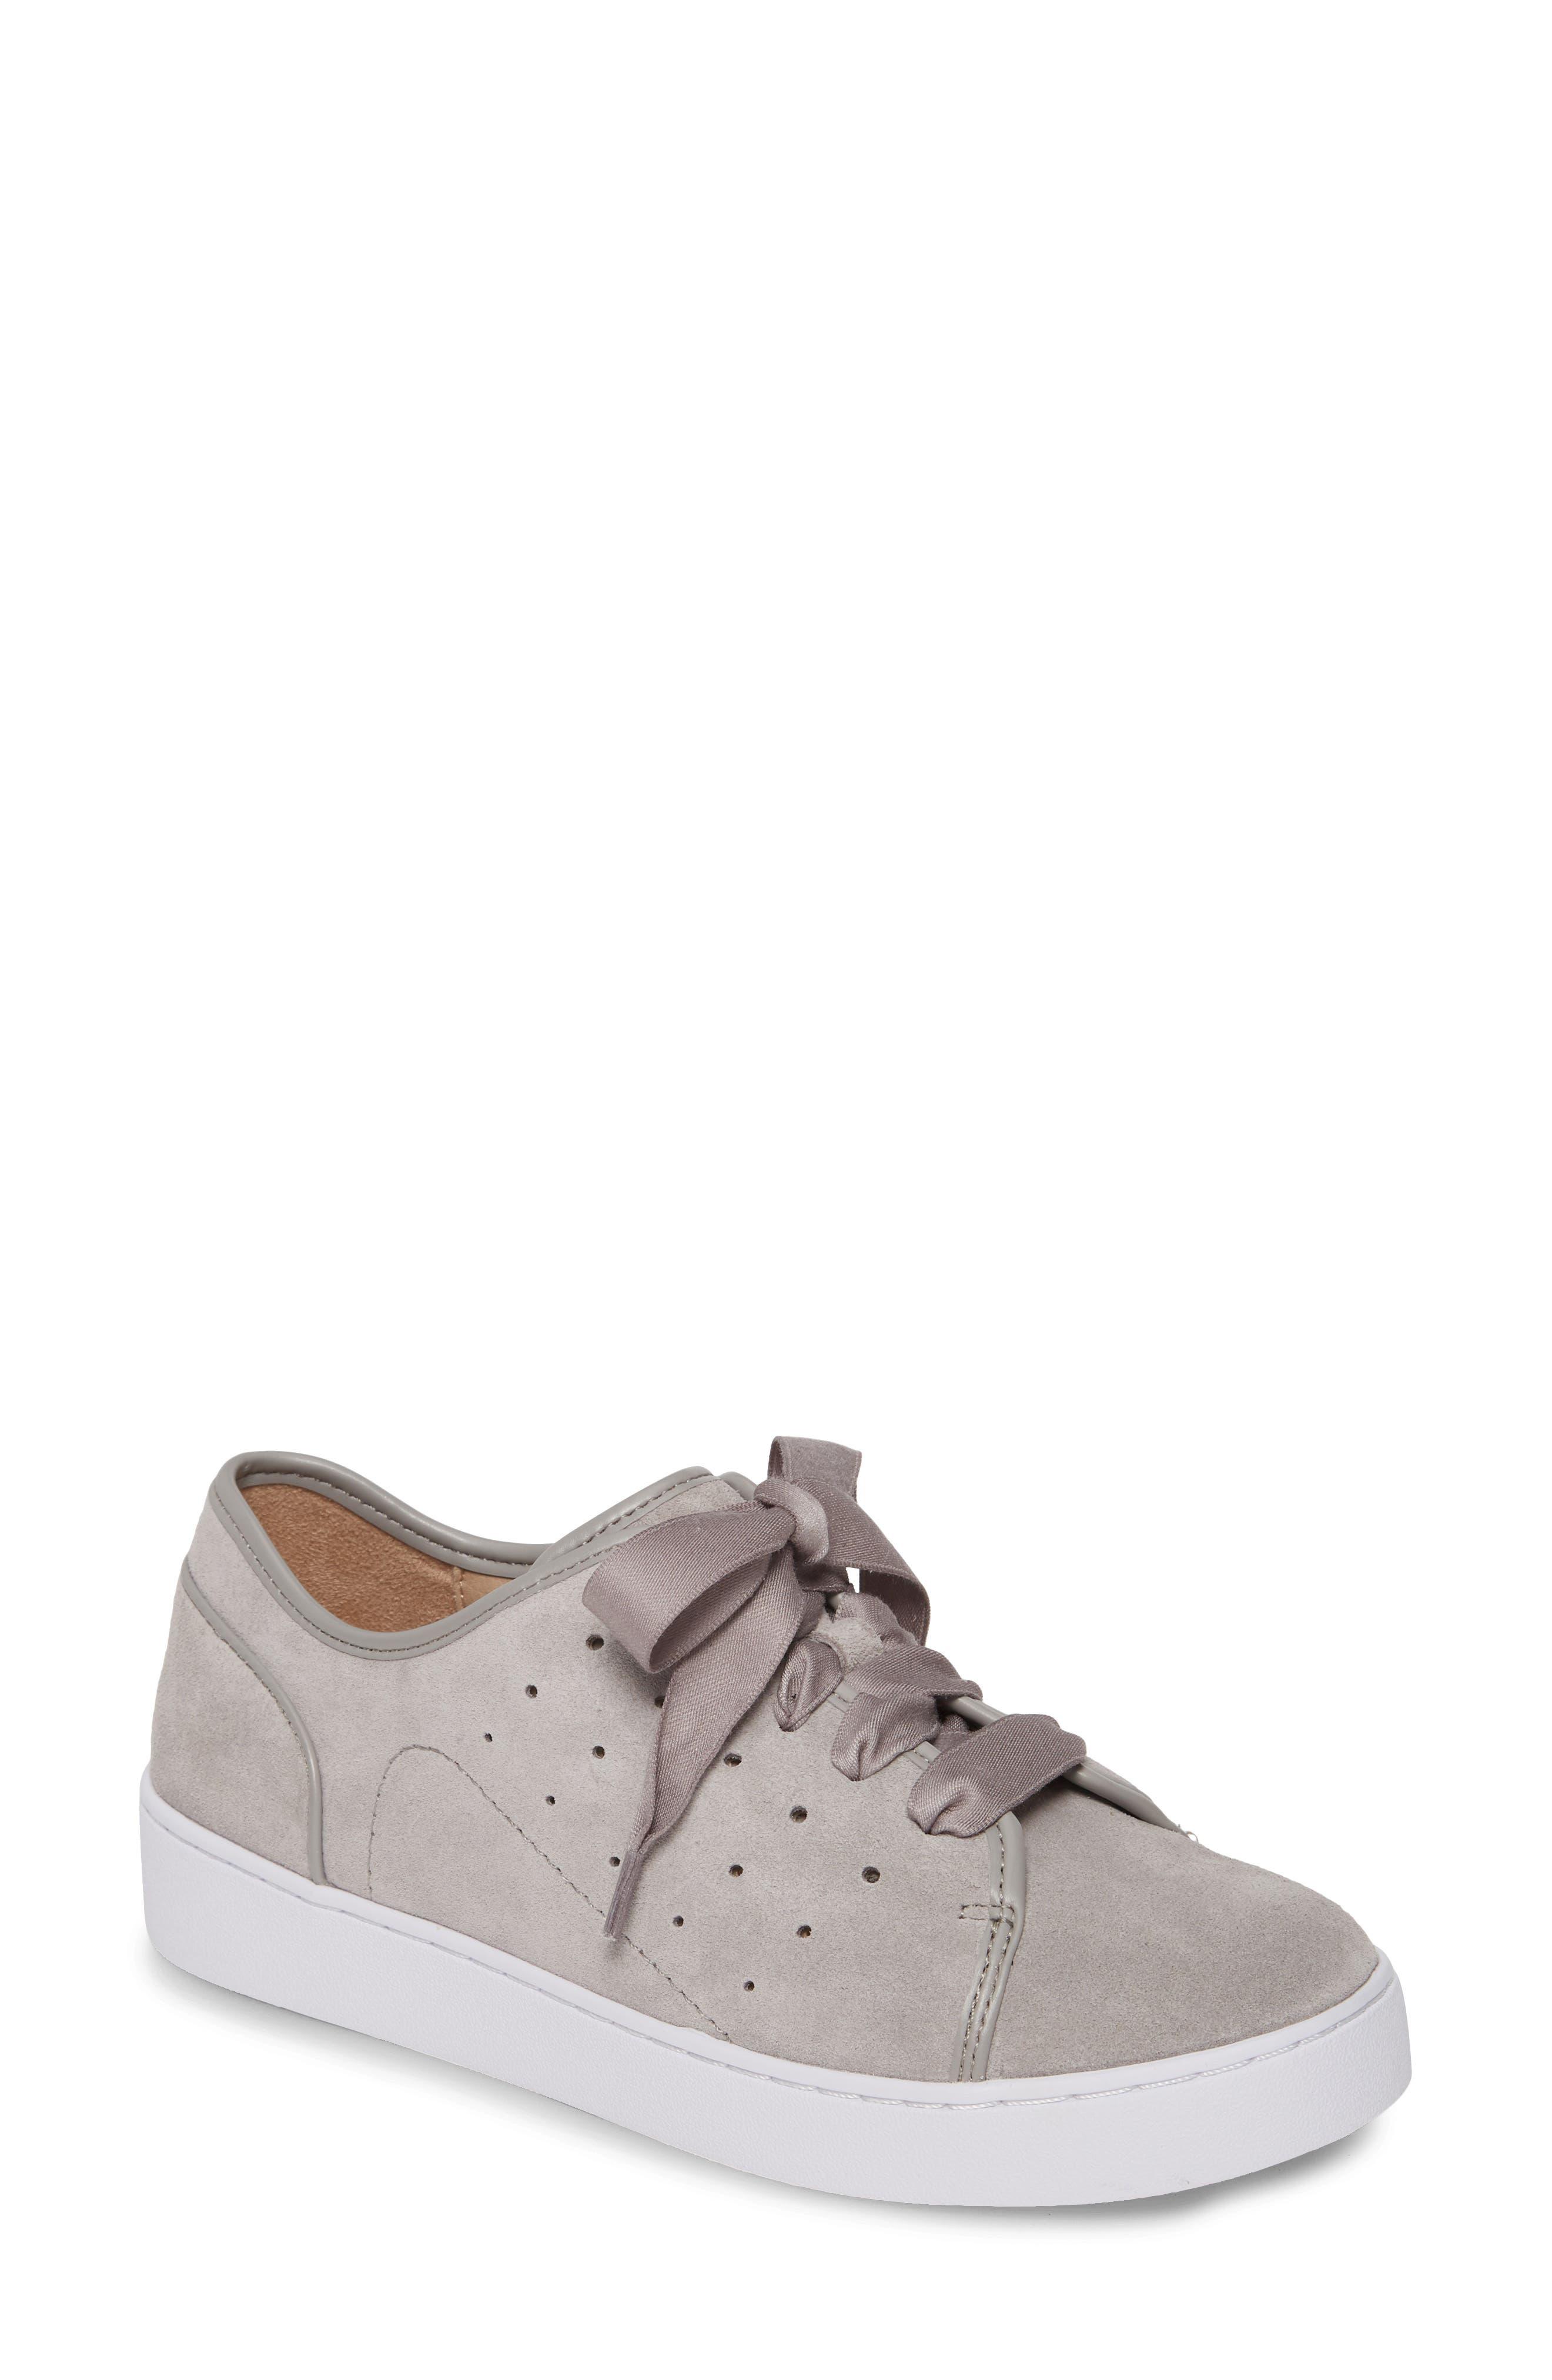 Vionic Keke Sneaker- Grey